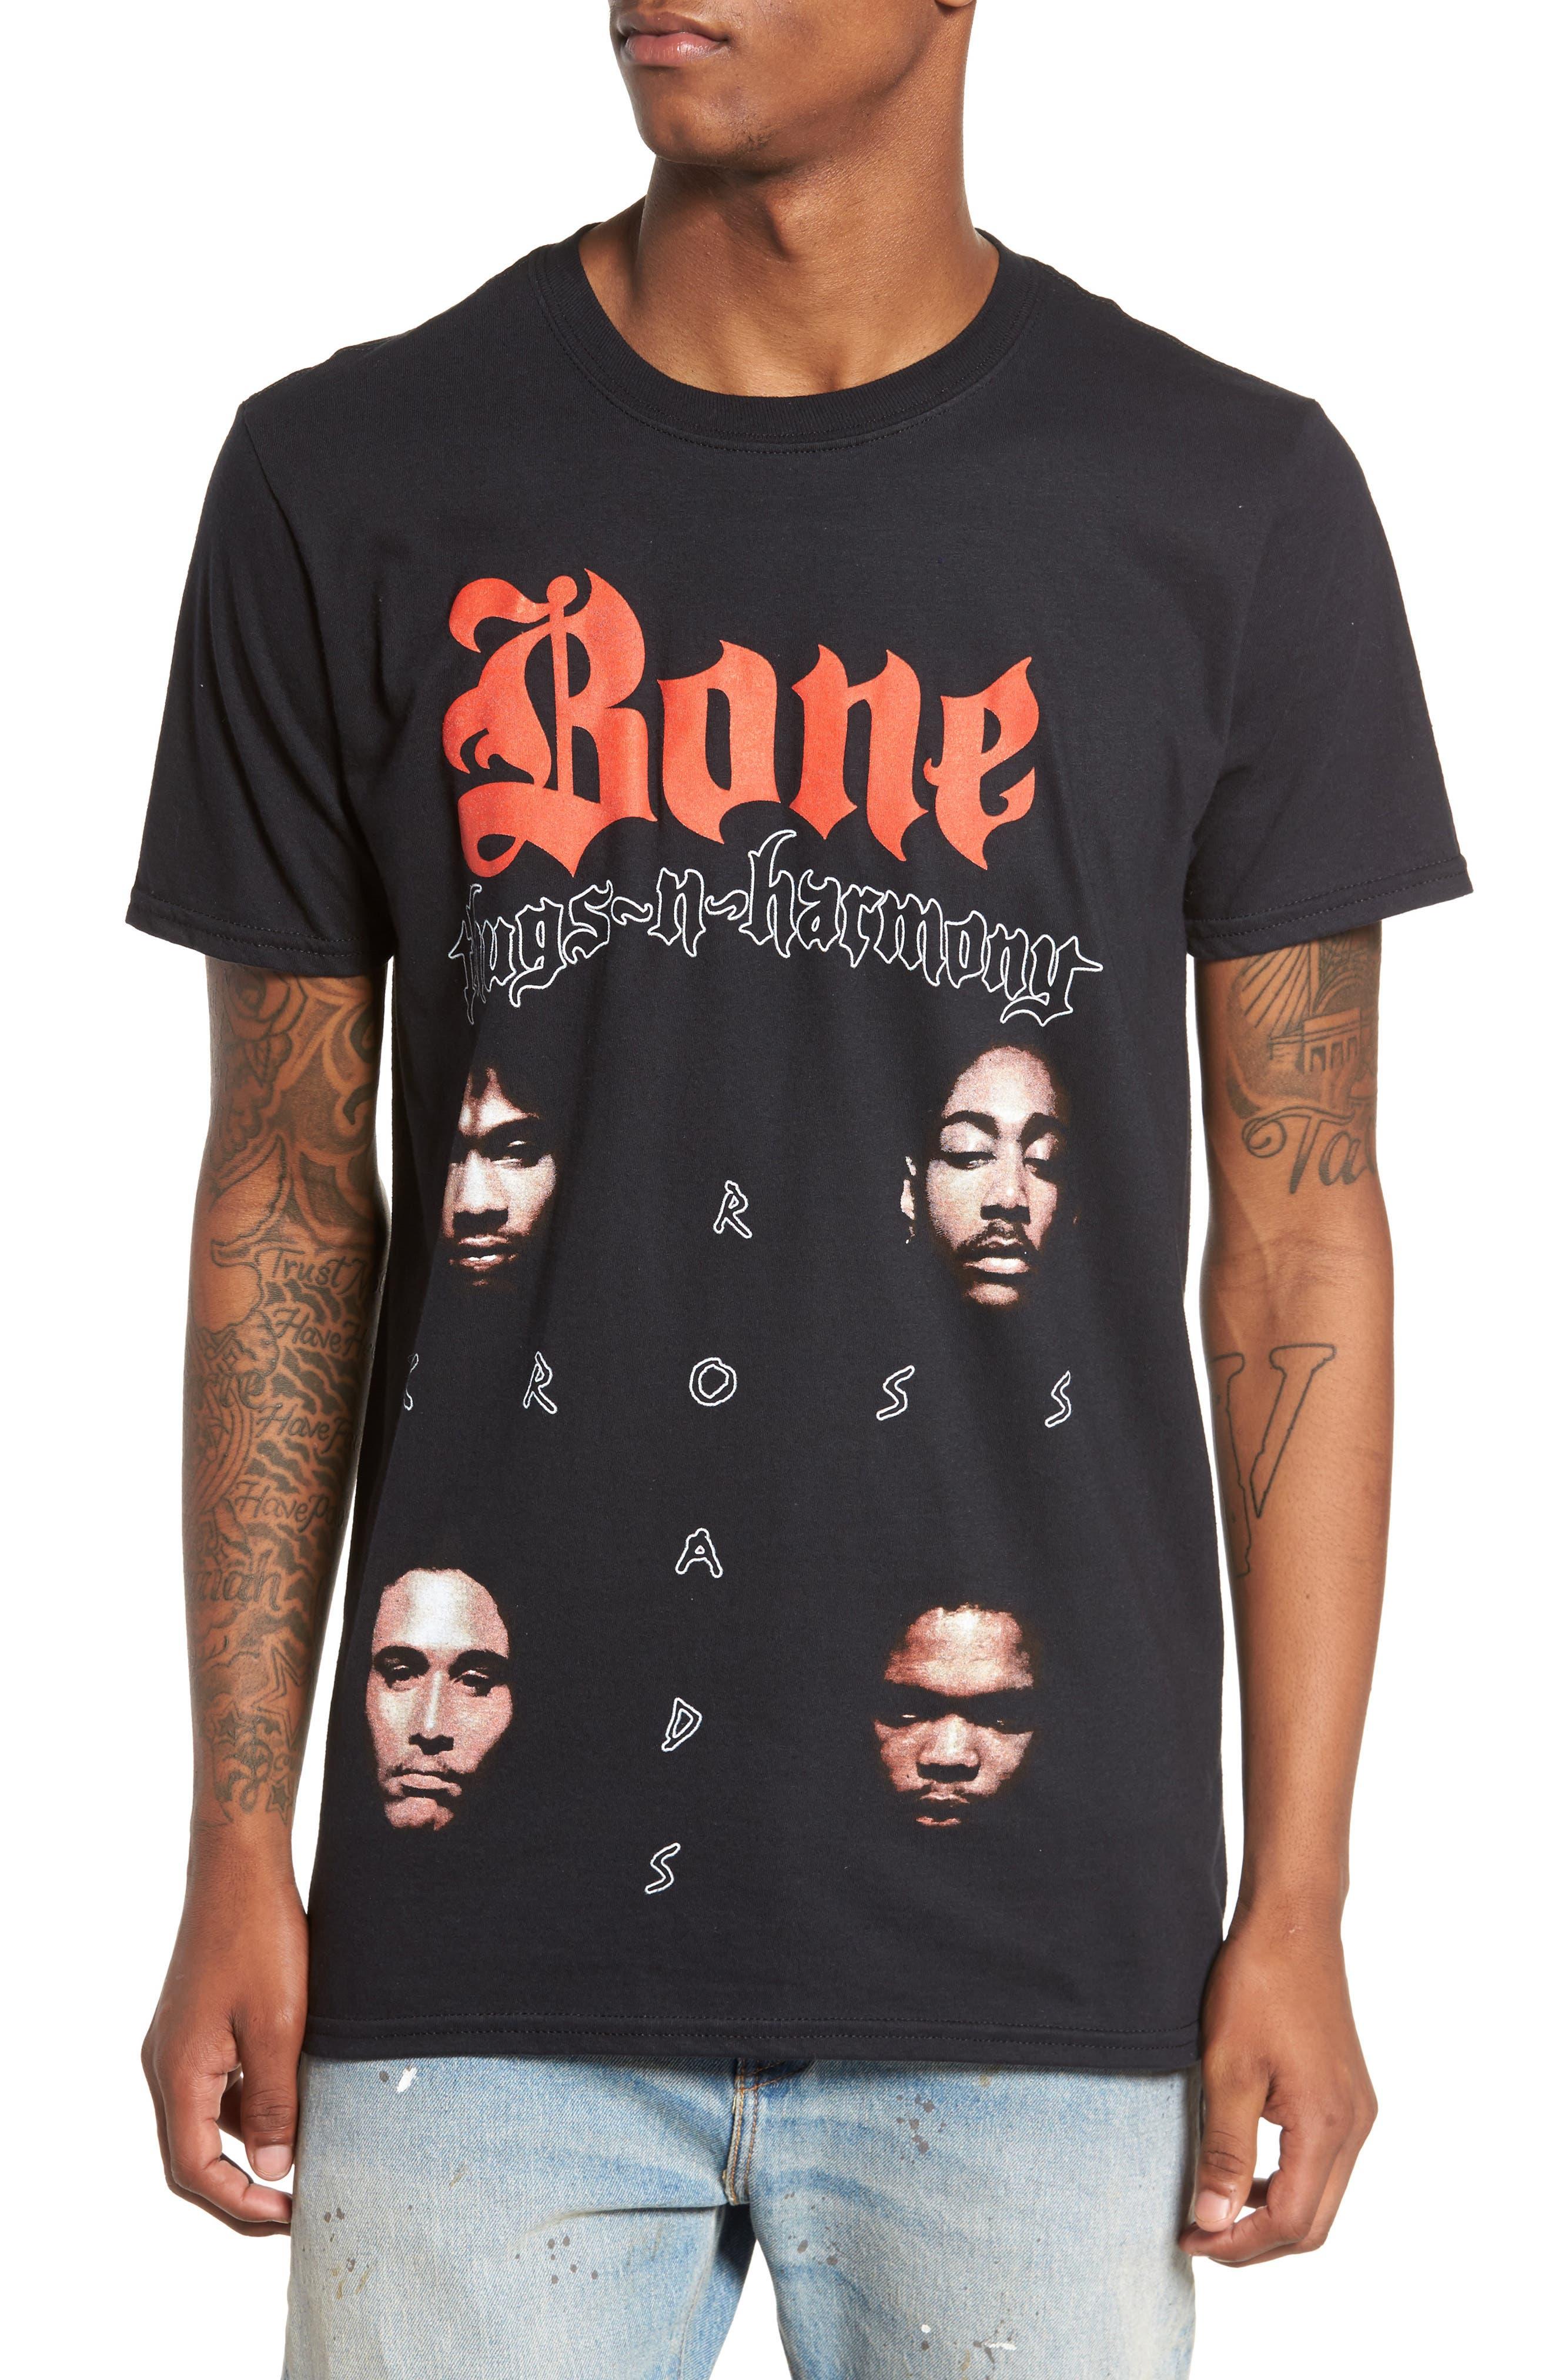 Bone Thugs-n-Harmony T-Shirt,                             Main thumbnail 1, color,                             Black Tee Bone Thugs